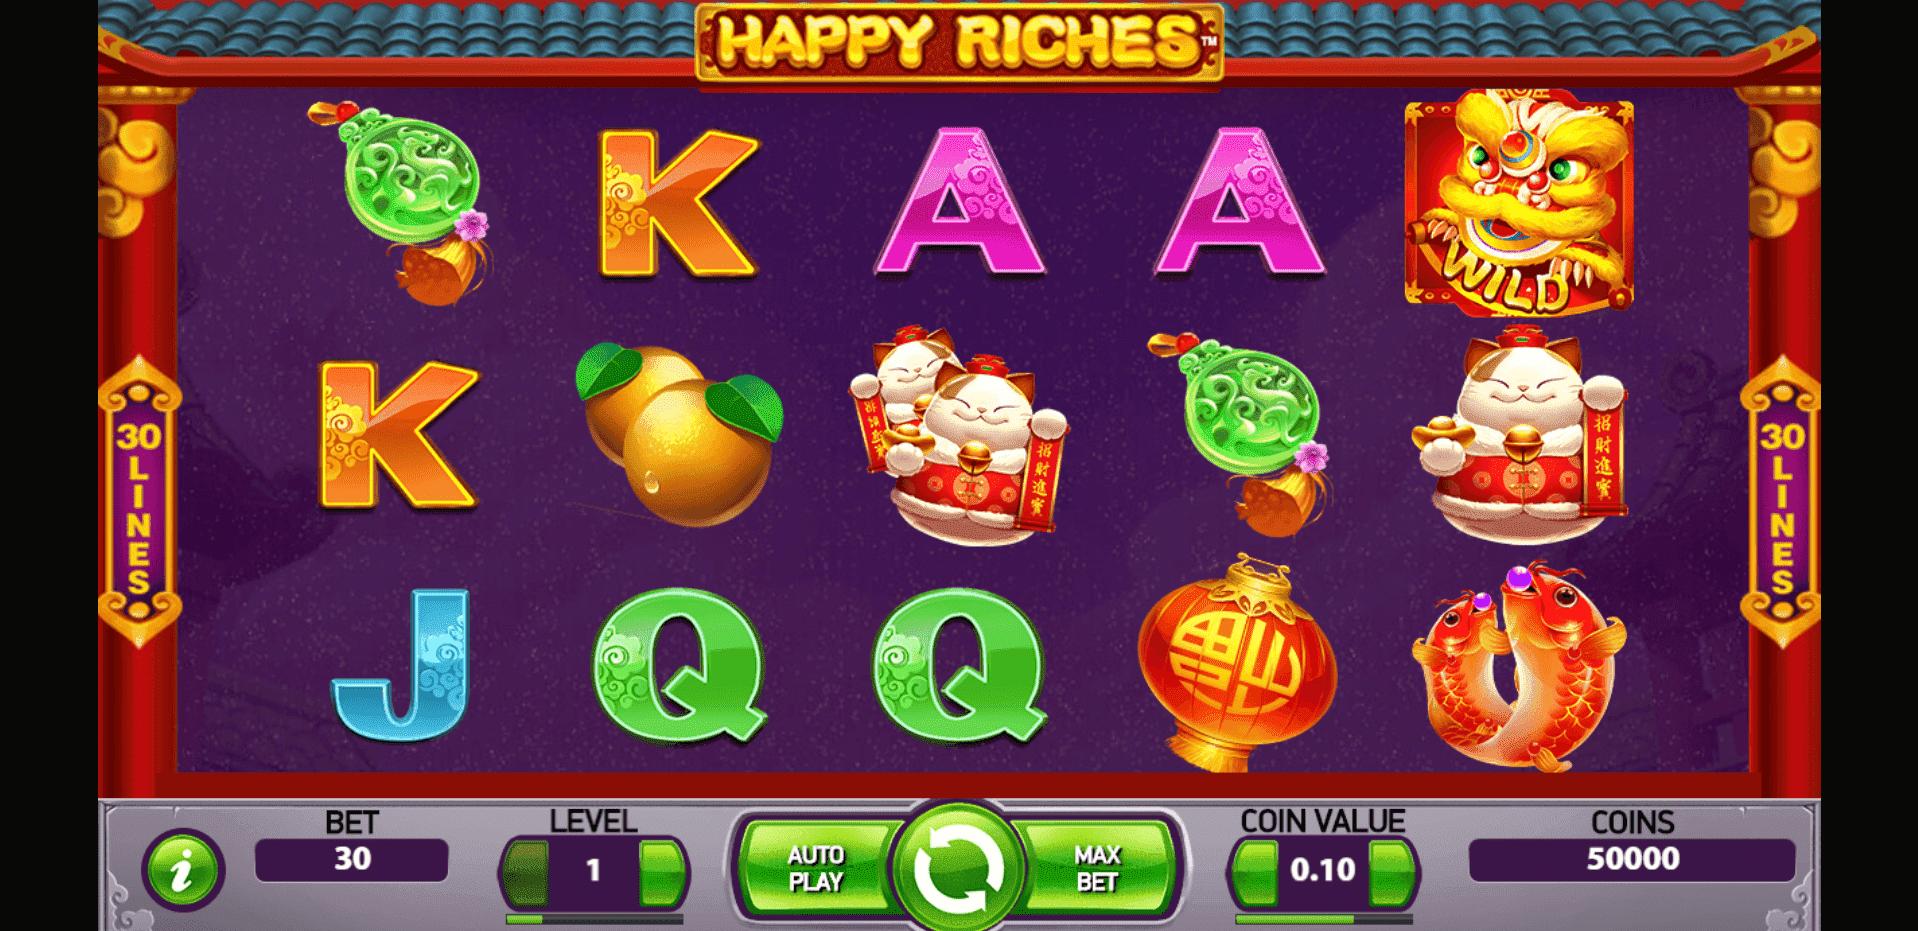 Happy Riches slot machine screenshot